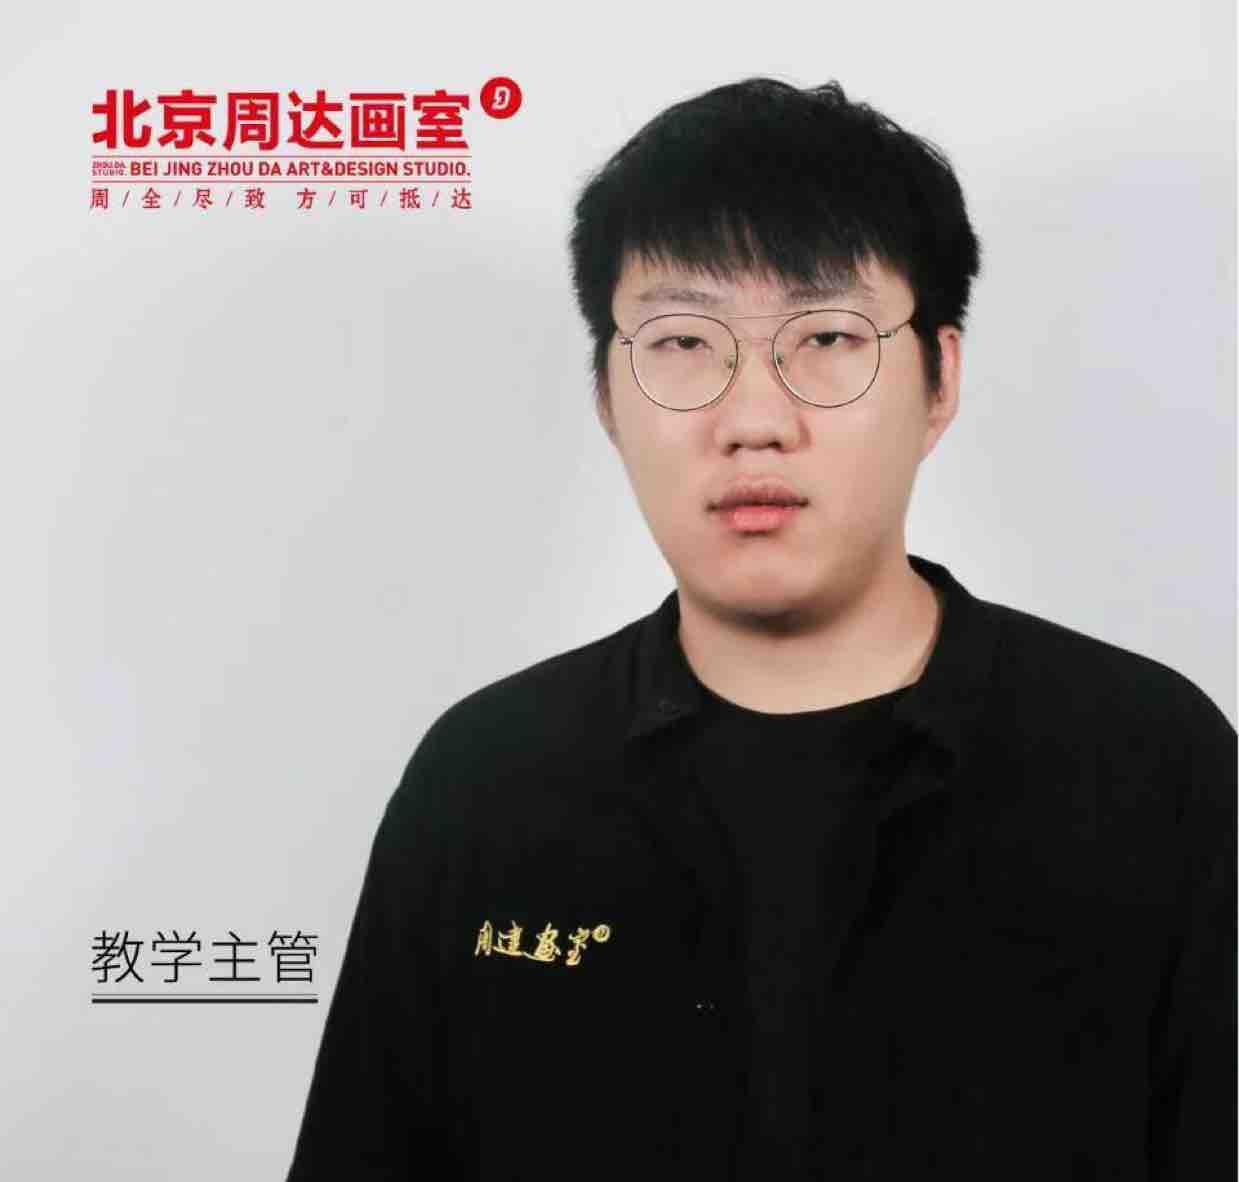 天津美院-肖建鑫